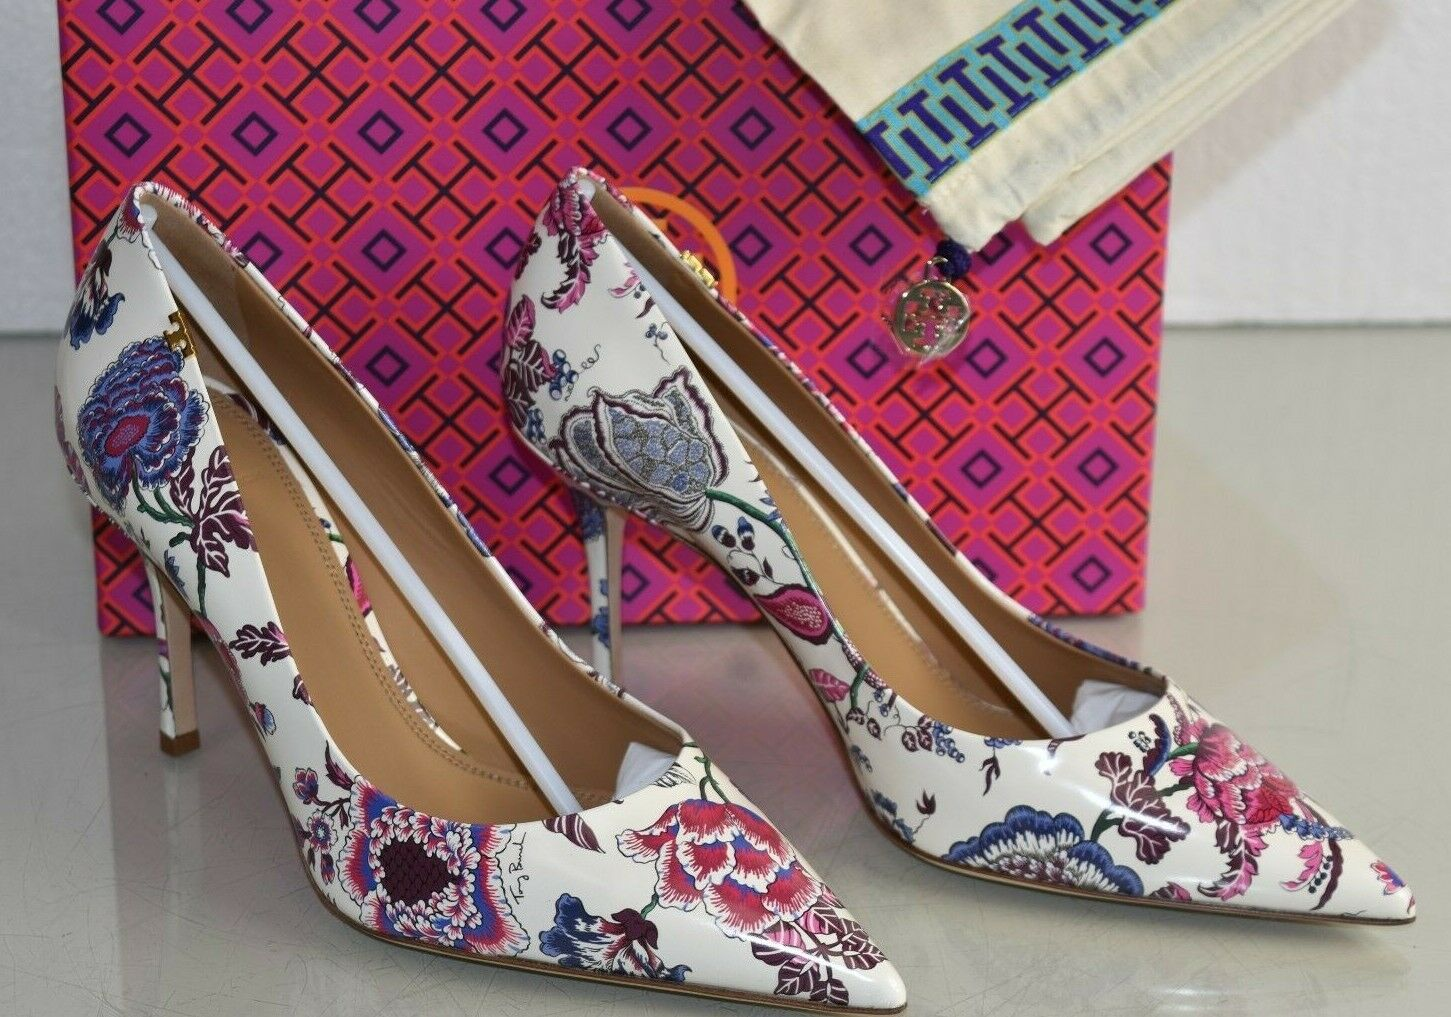 6221de3e8 ... 378 NEW Tory Burch PENELOPE 85 PRINTED PUMPS Happy Happy Happy Times  Floral blanc Heels 10 ...